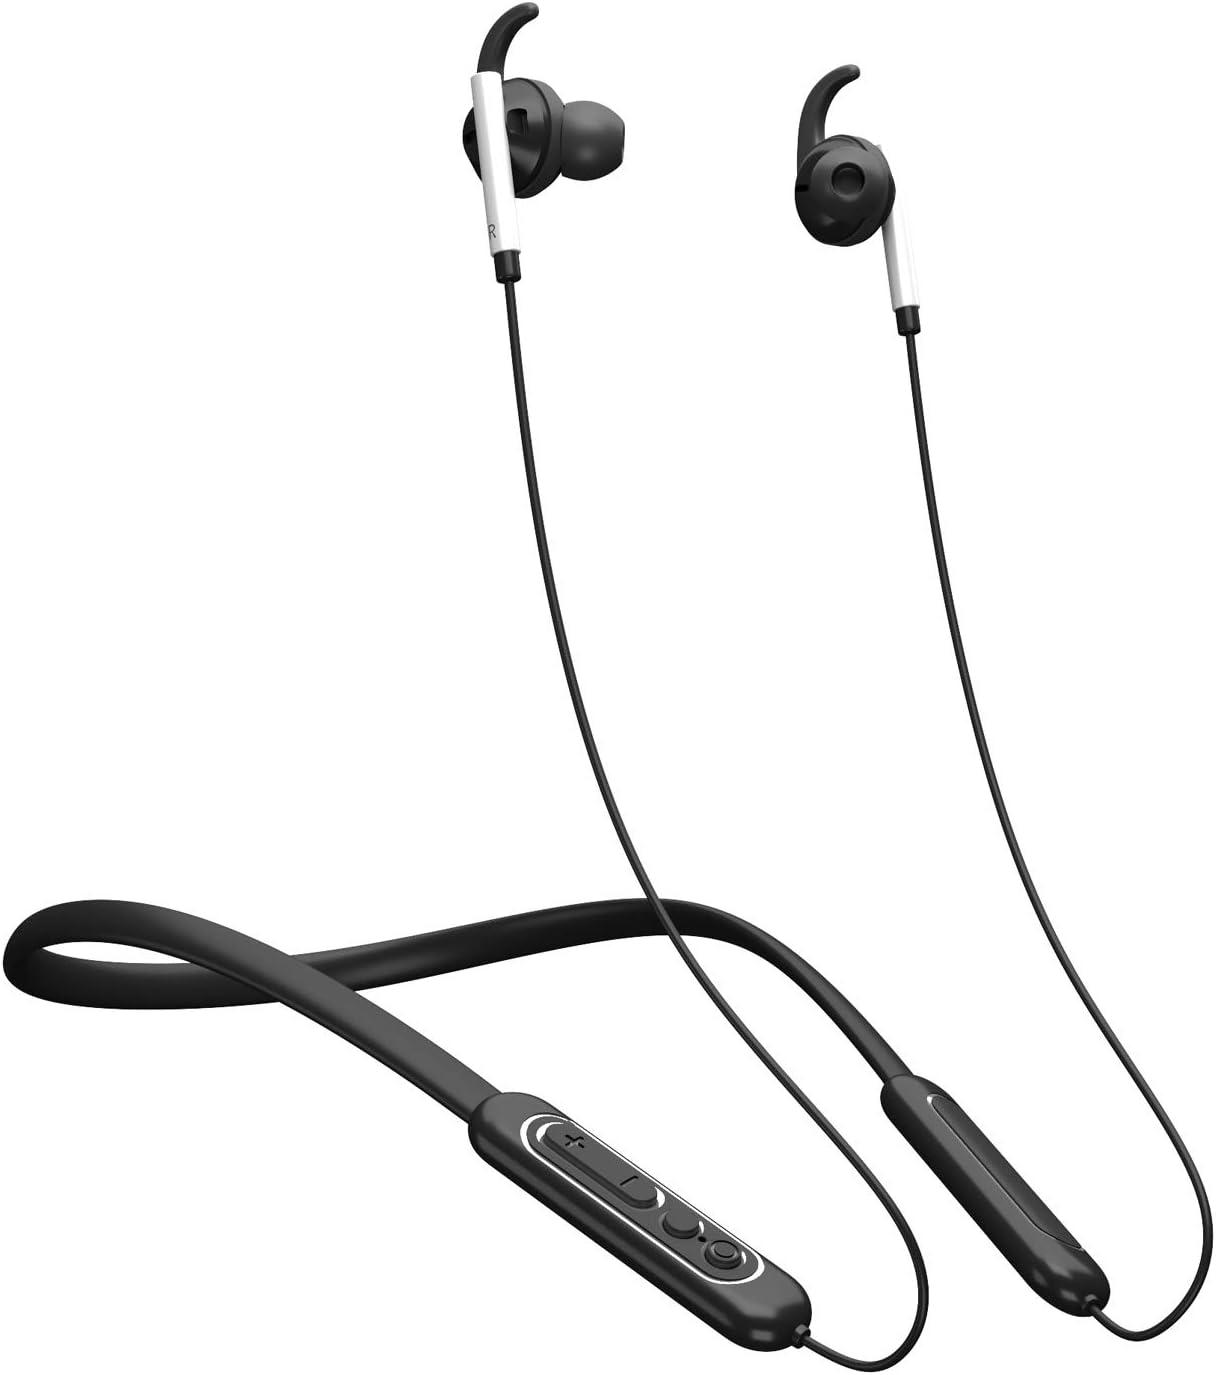 Amazon Promo Code 2020 for Bluetooth Headphones Neckband